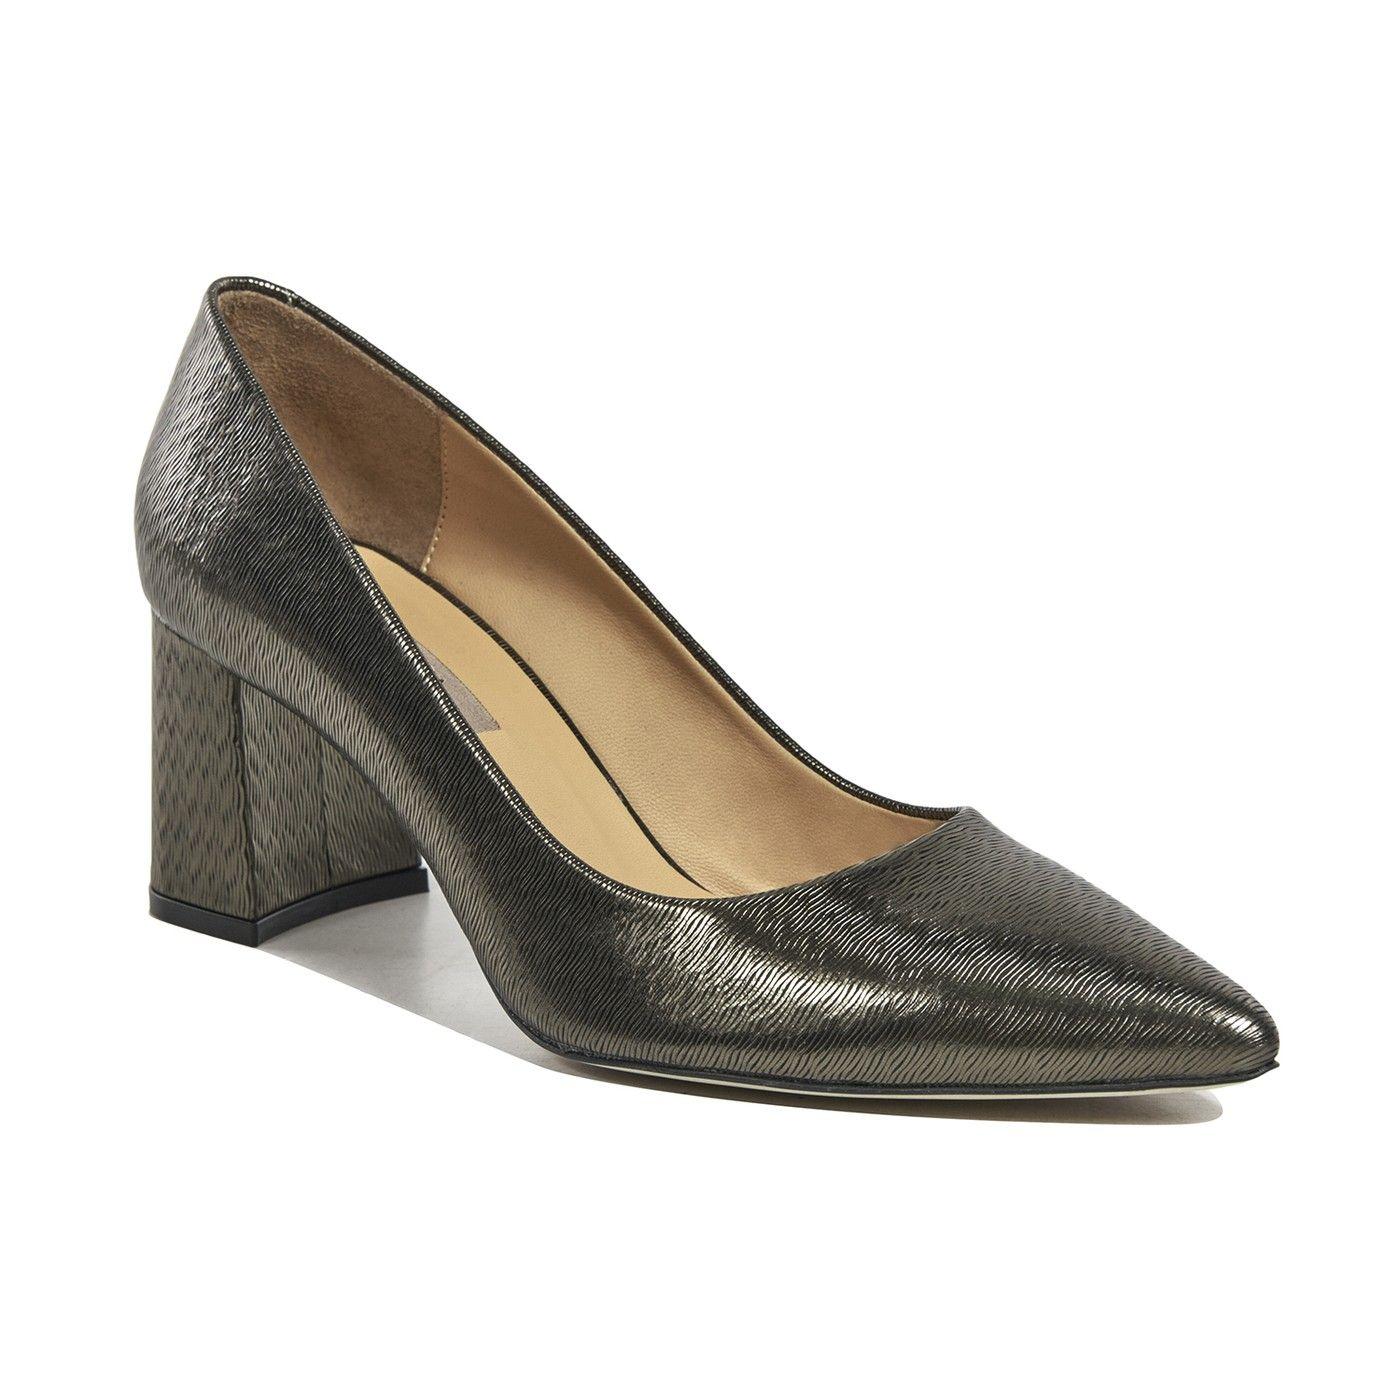 Kadin Deri Klasik Topuklu Ayakkabi Shoes Fashion Flats